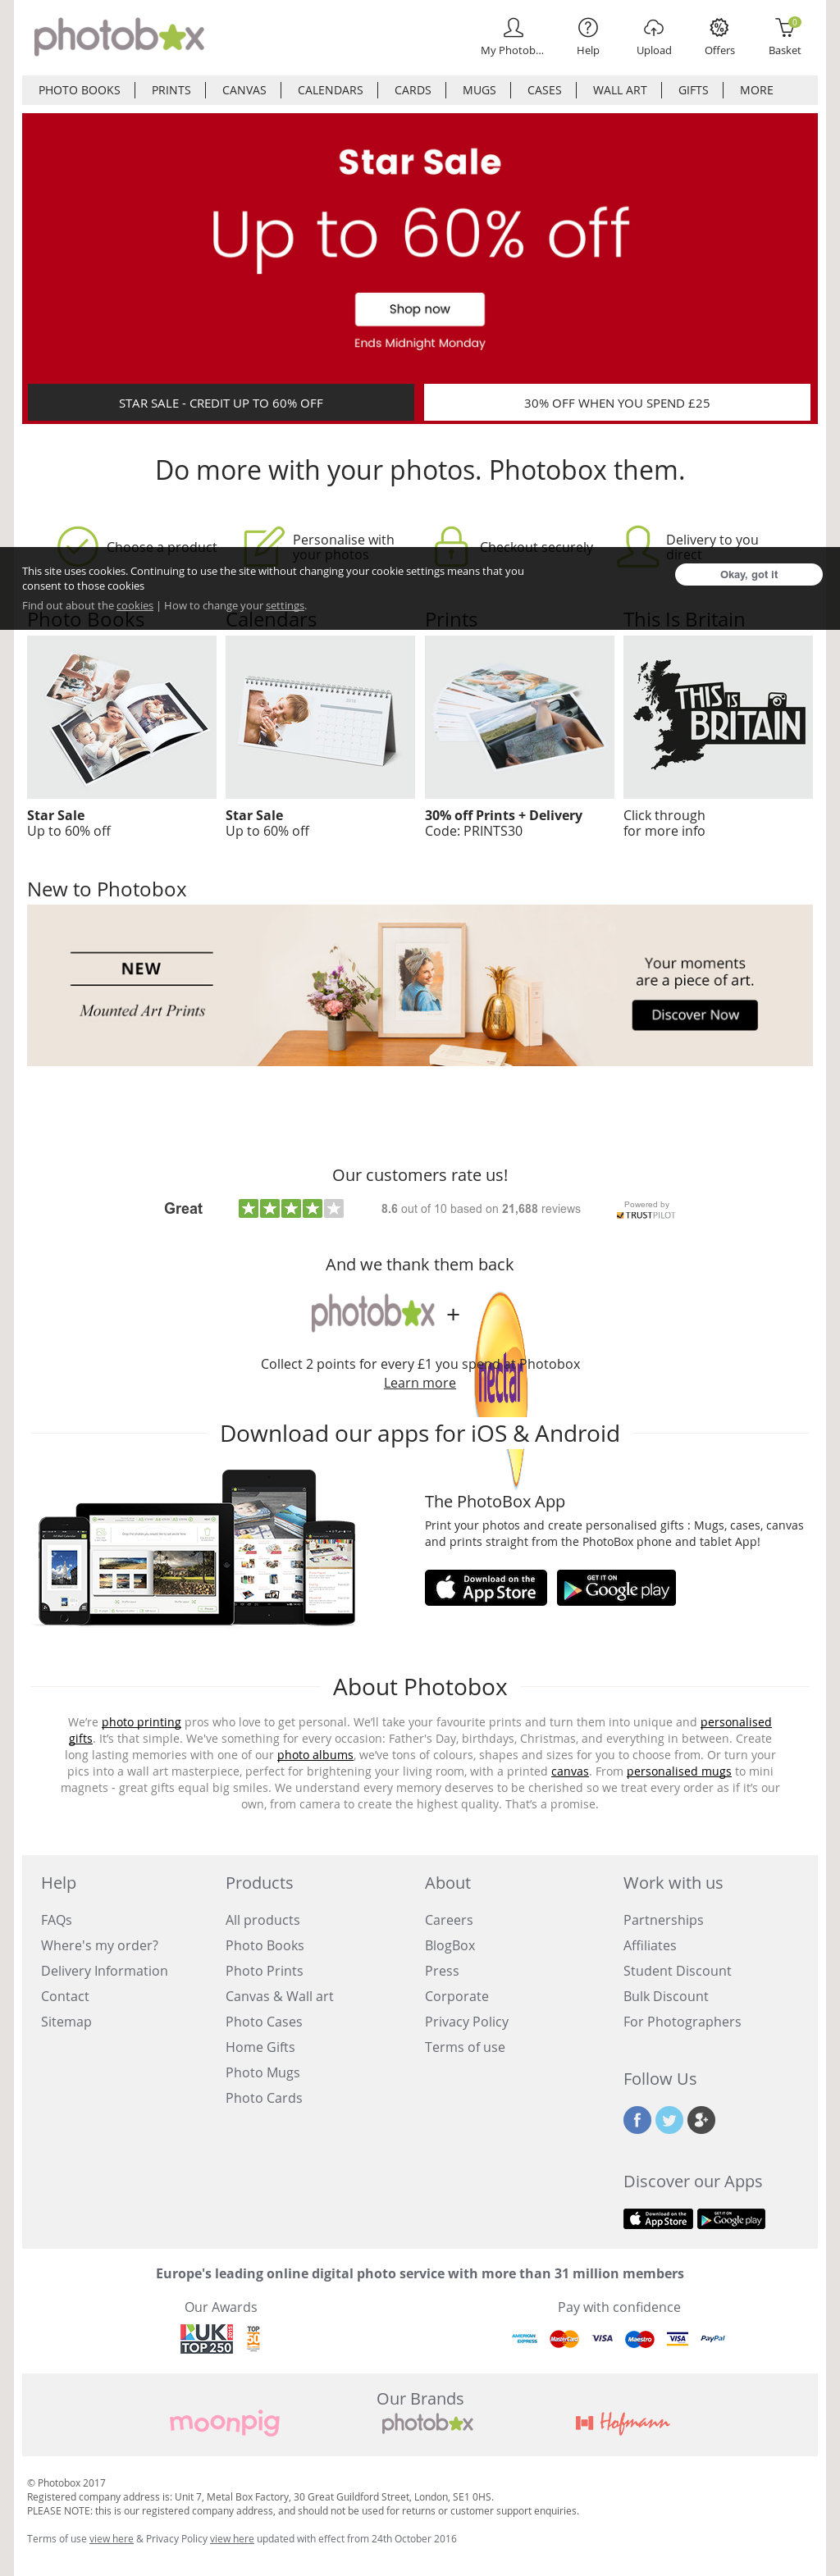 PhotoBox Competitors, Revenue and Employees - Owler Company Profile